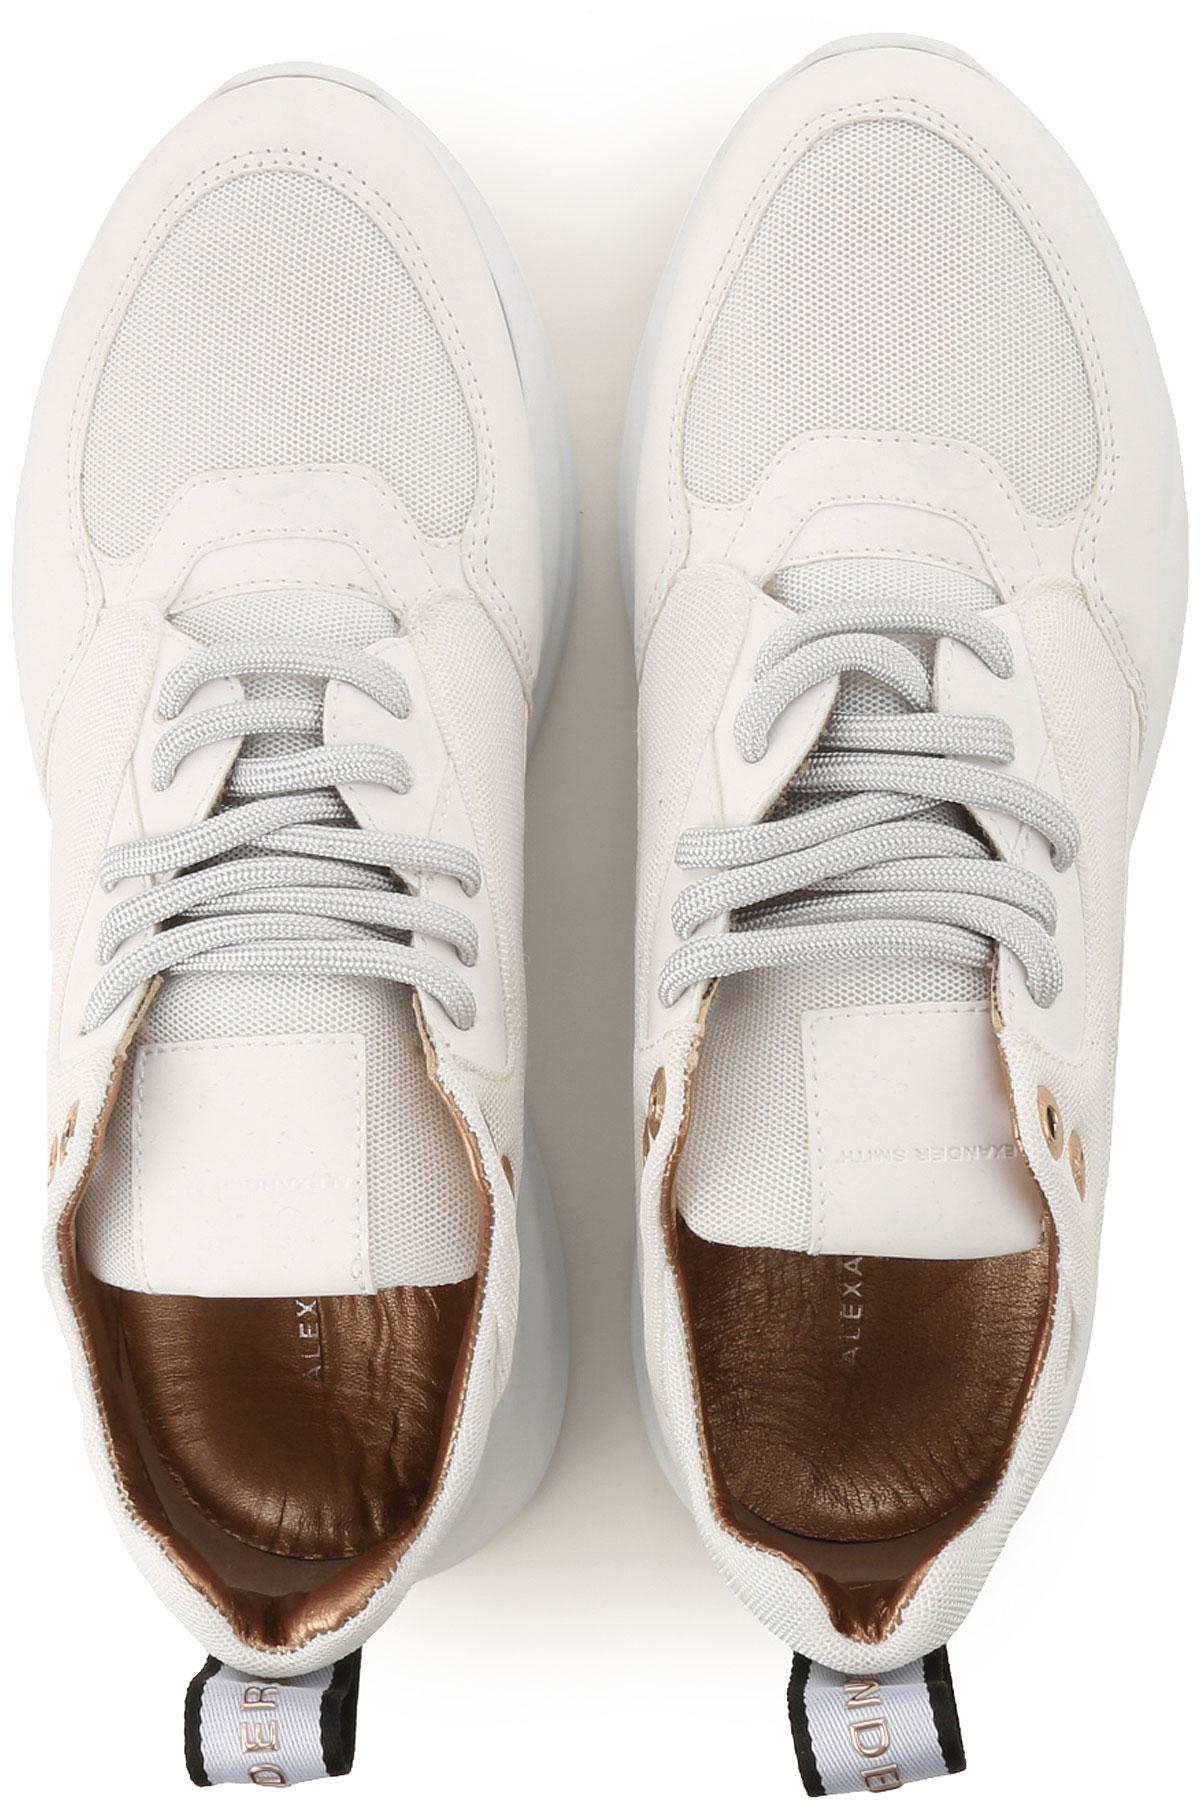 Zapatos Alexander 2019 Para verano Cobre Mujer Smith Blanco Primavera 775Aqa4Zwx